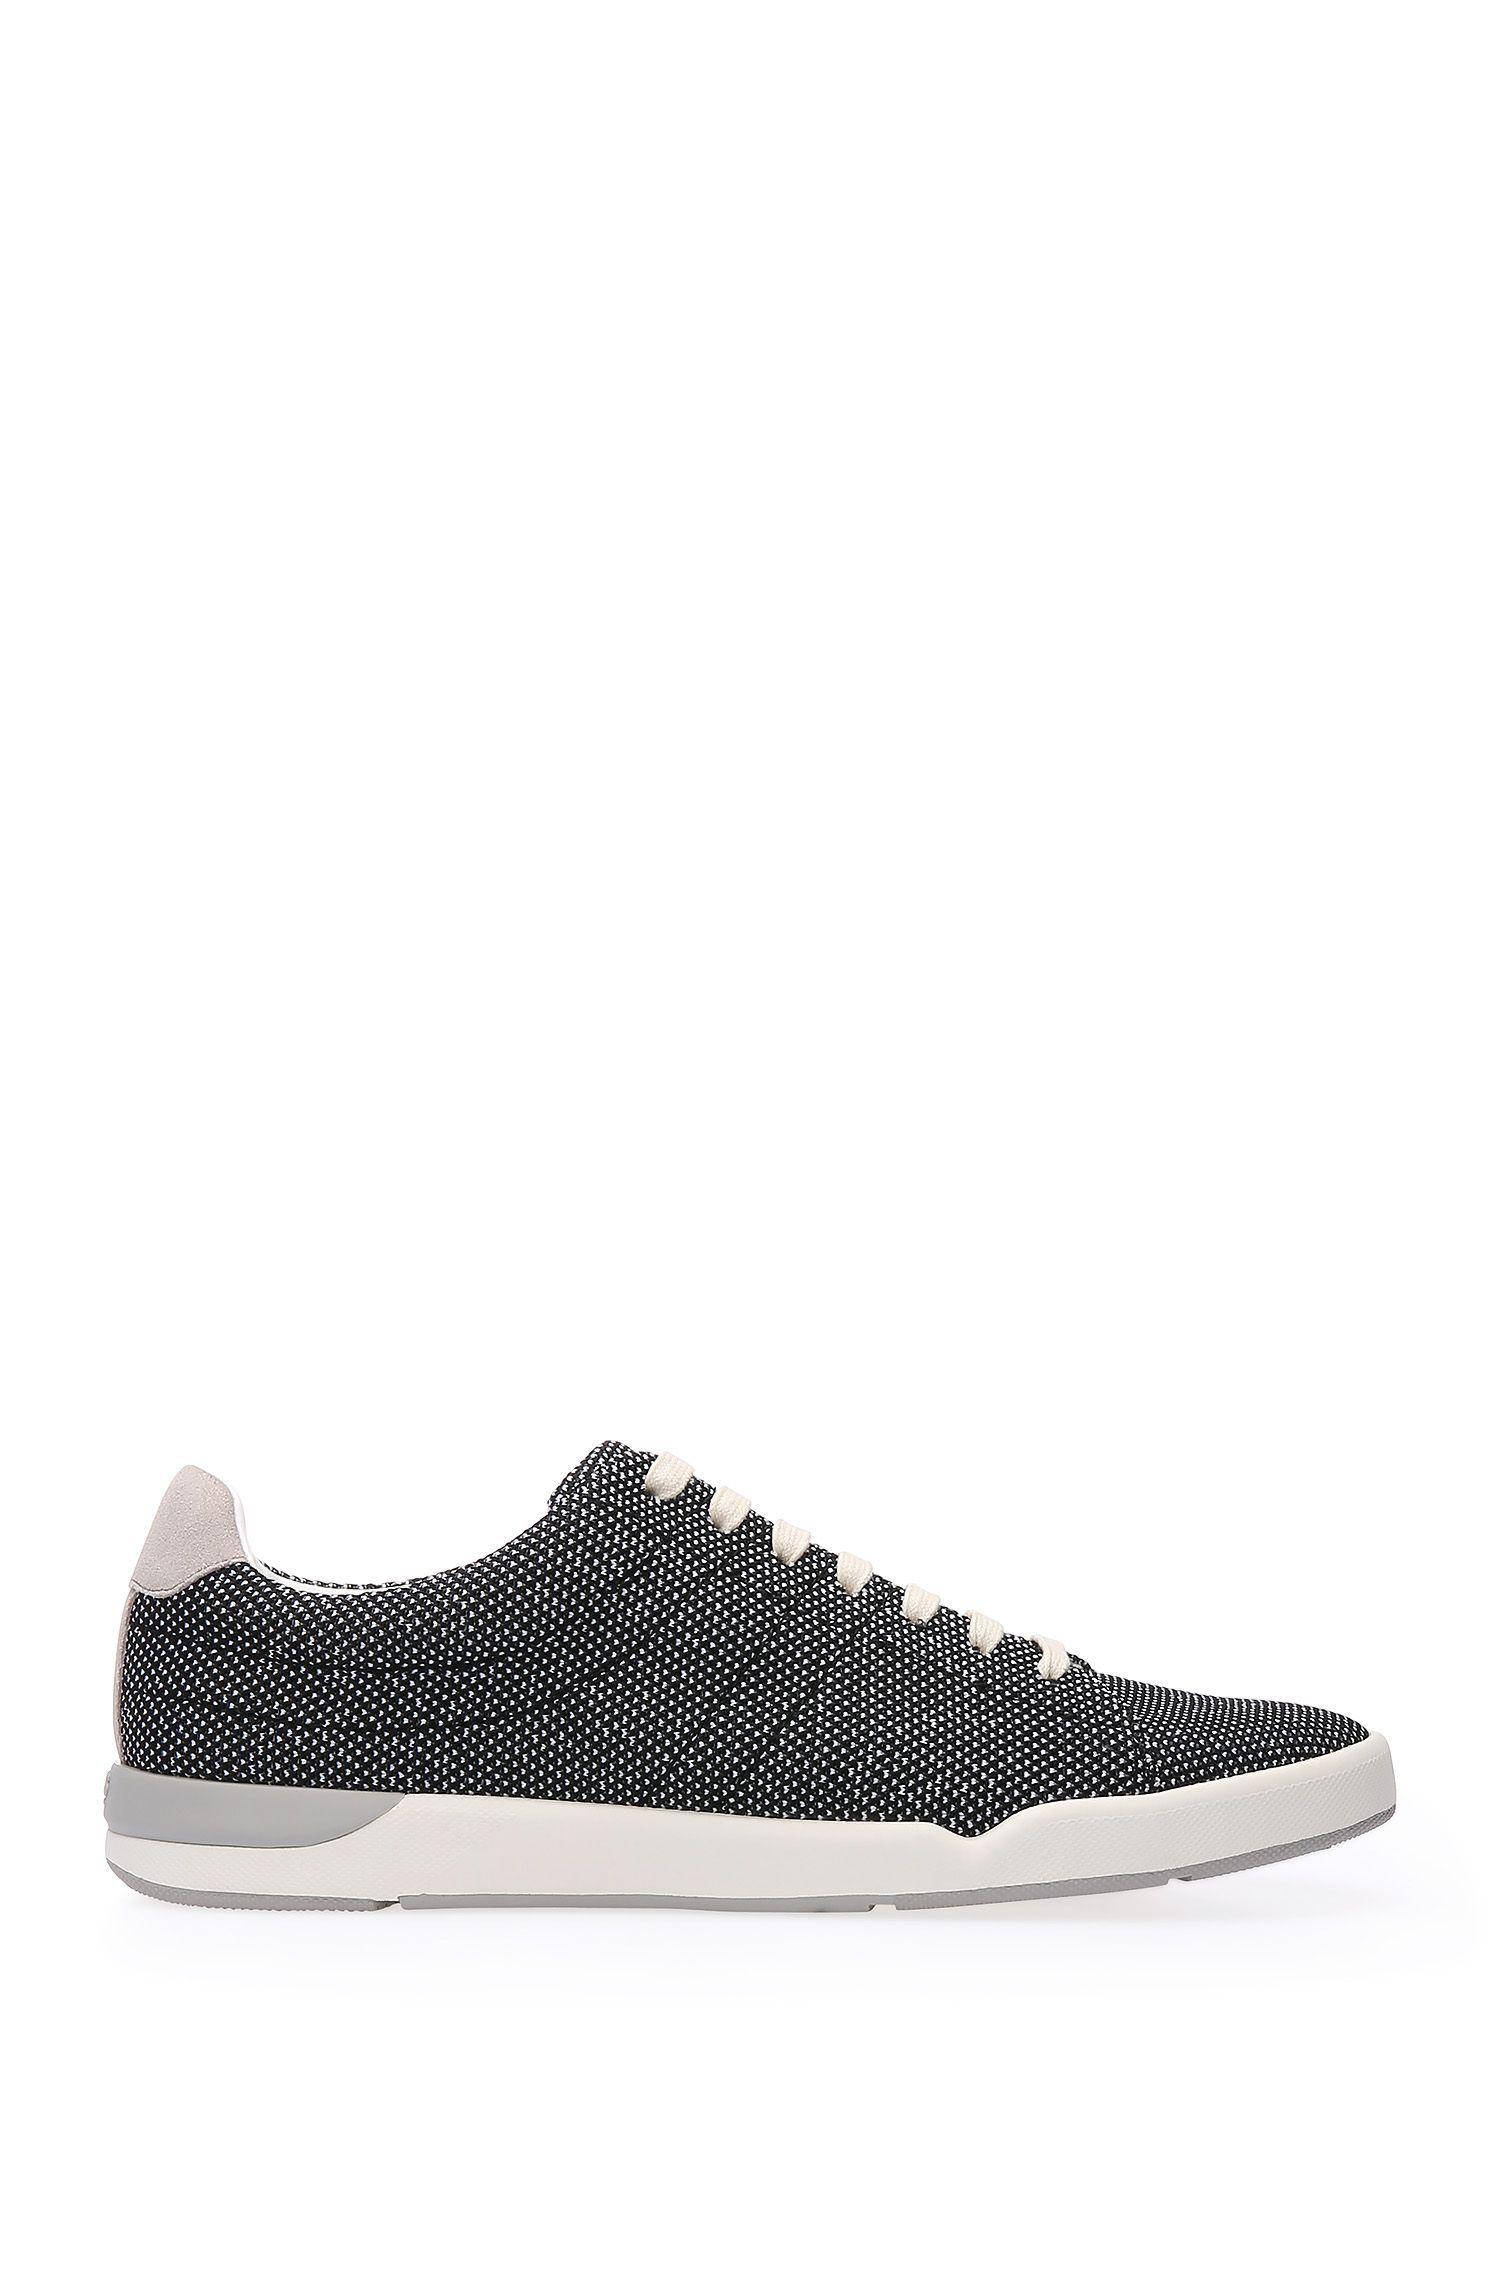 Sneakers aus strukturiertem Textil mit Lederbesätzen: ´Stillnes_Tenn_txms`